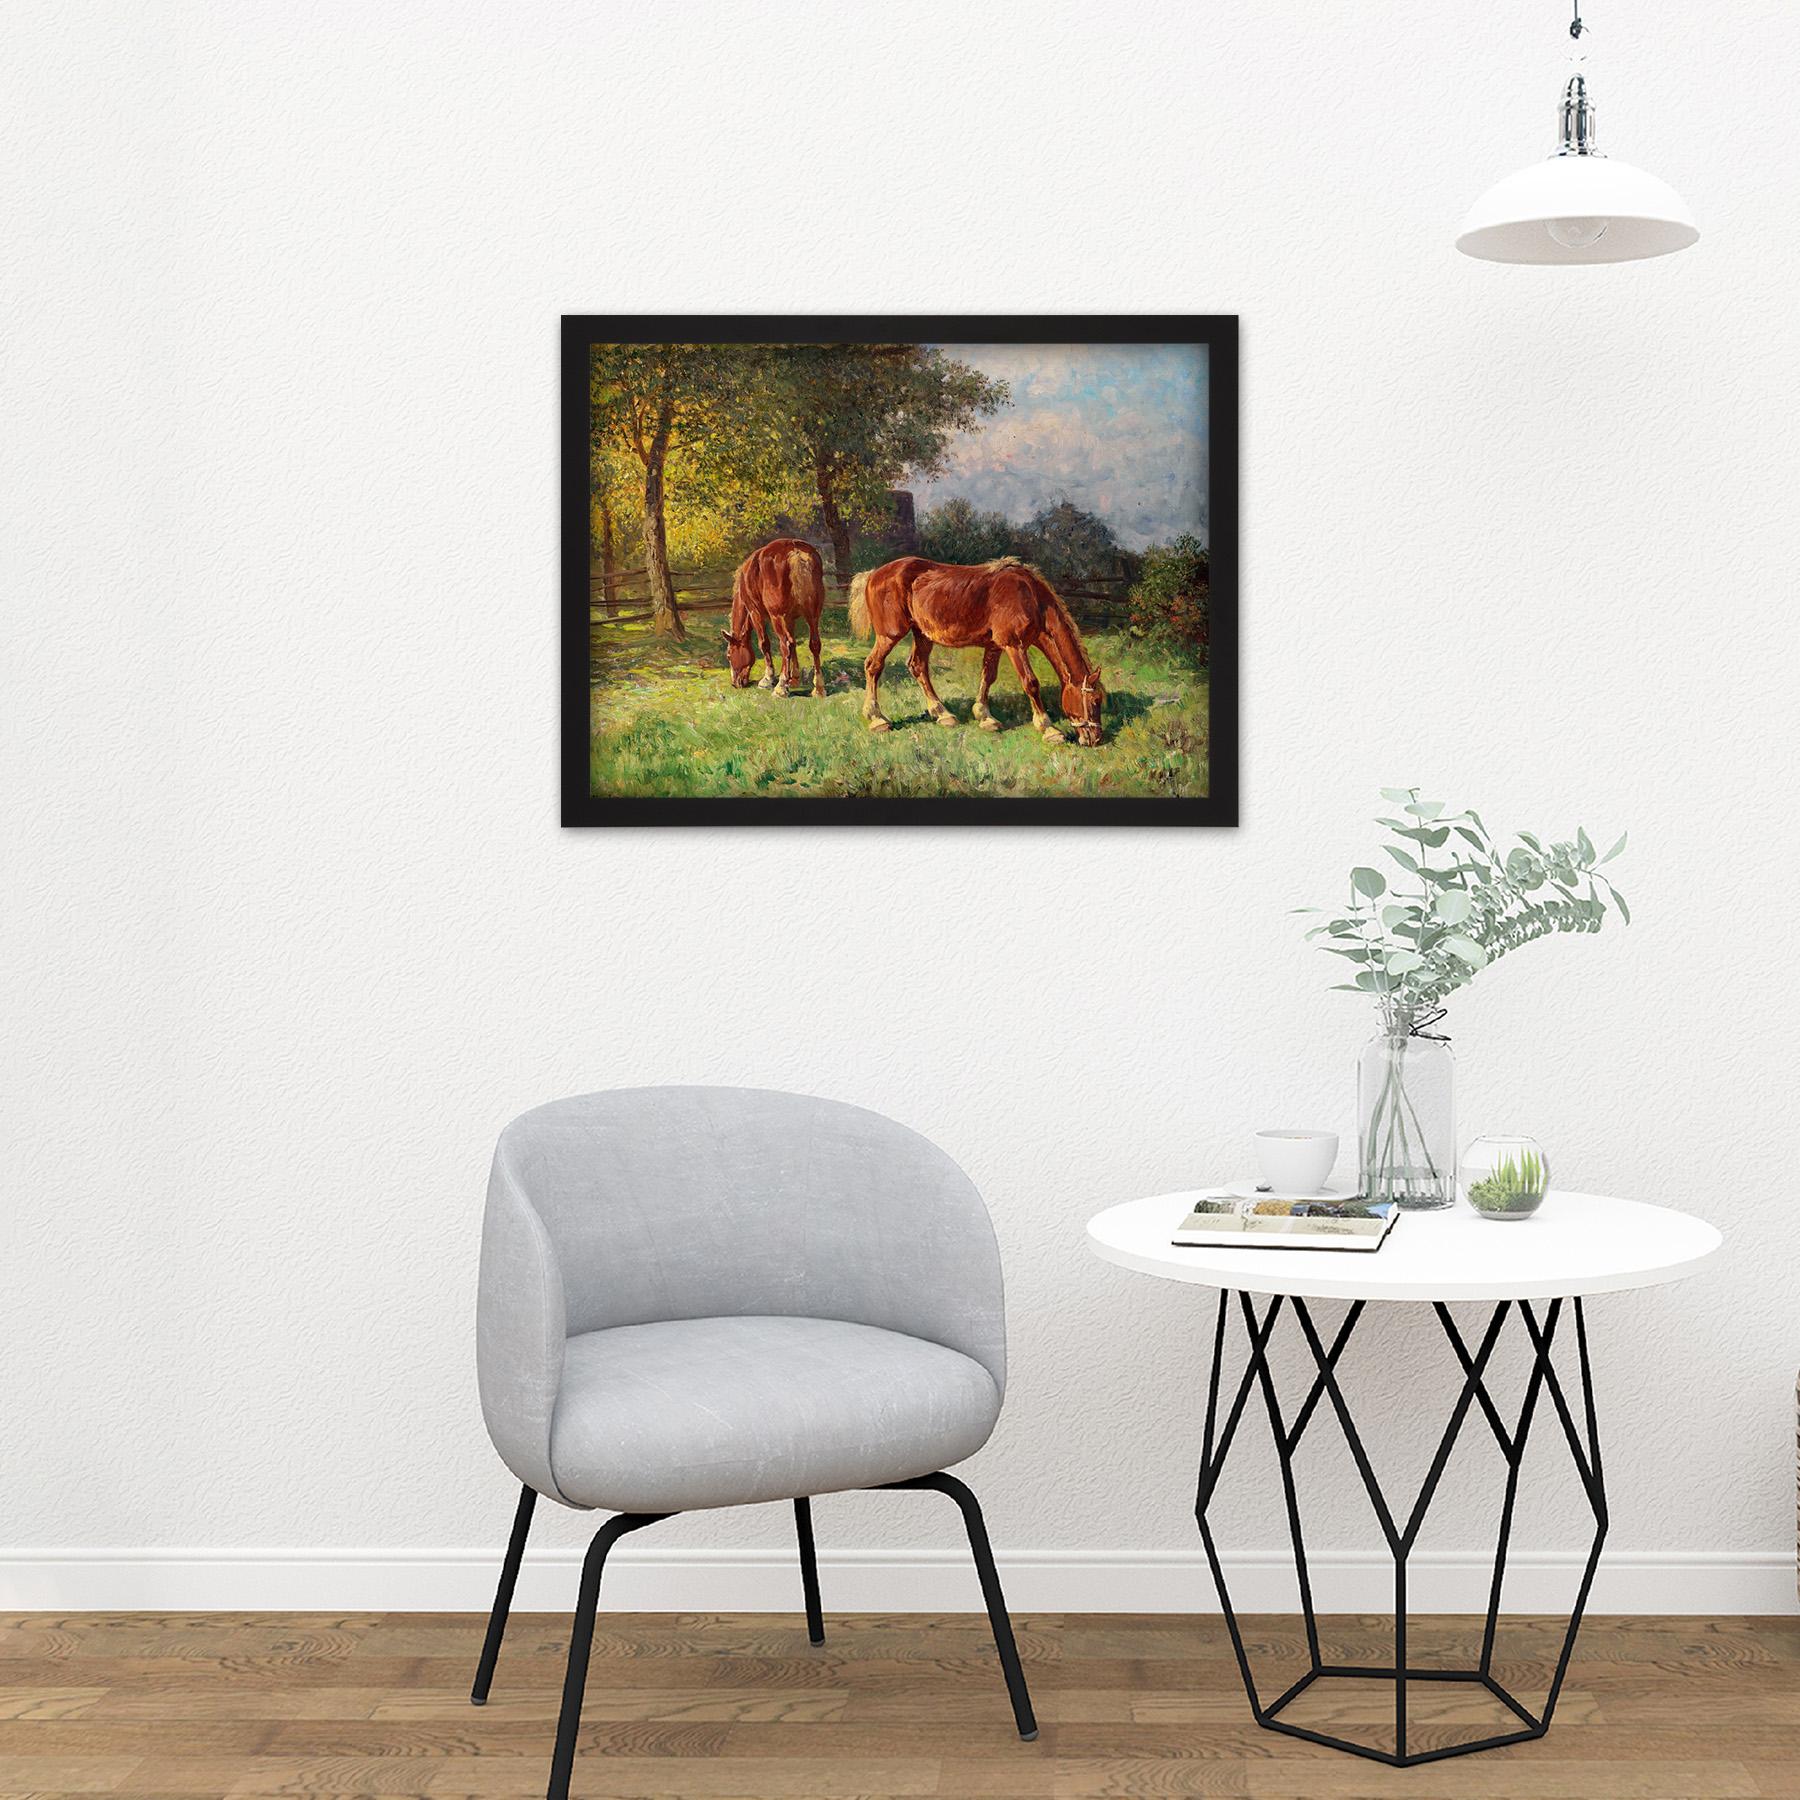 Van-Der-Venne-Horses-In-Pasture-Painting-Large-Framed-Art-Print thumbnail 8